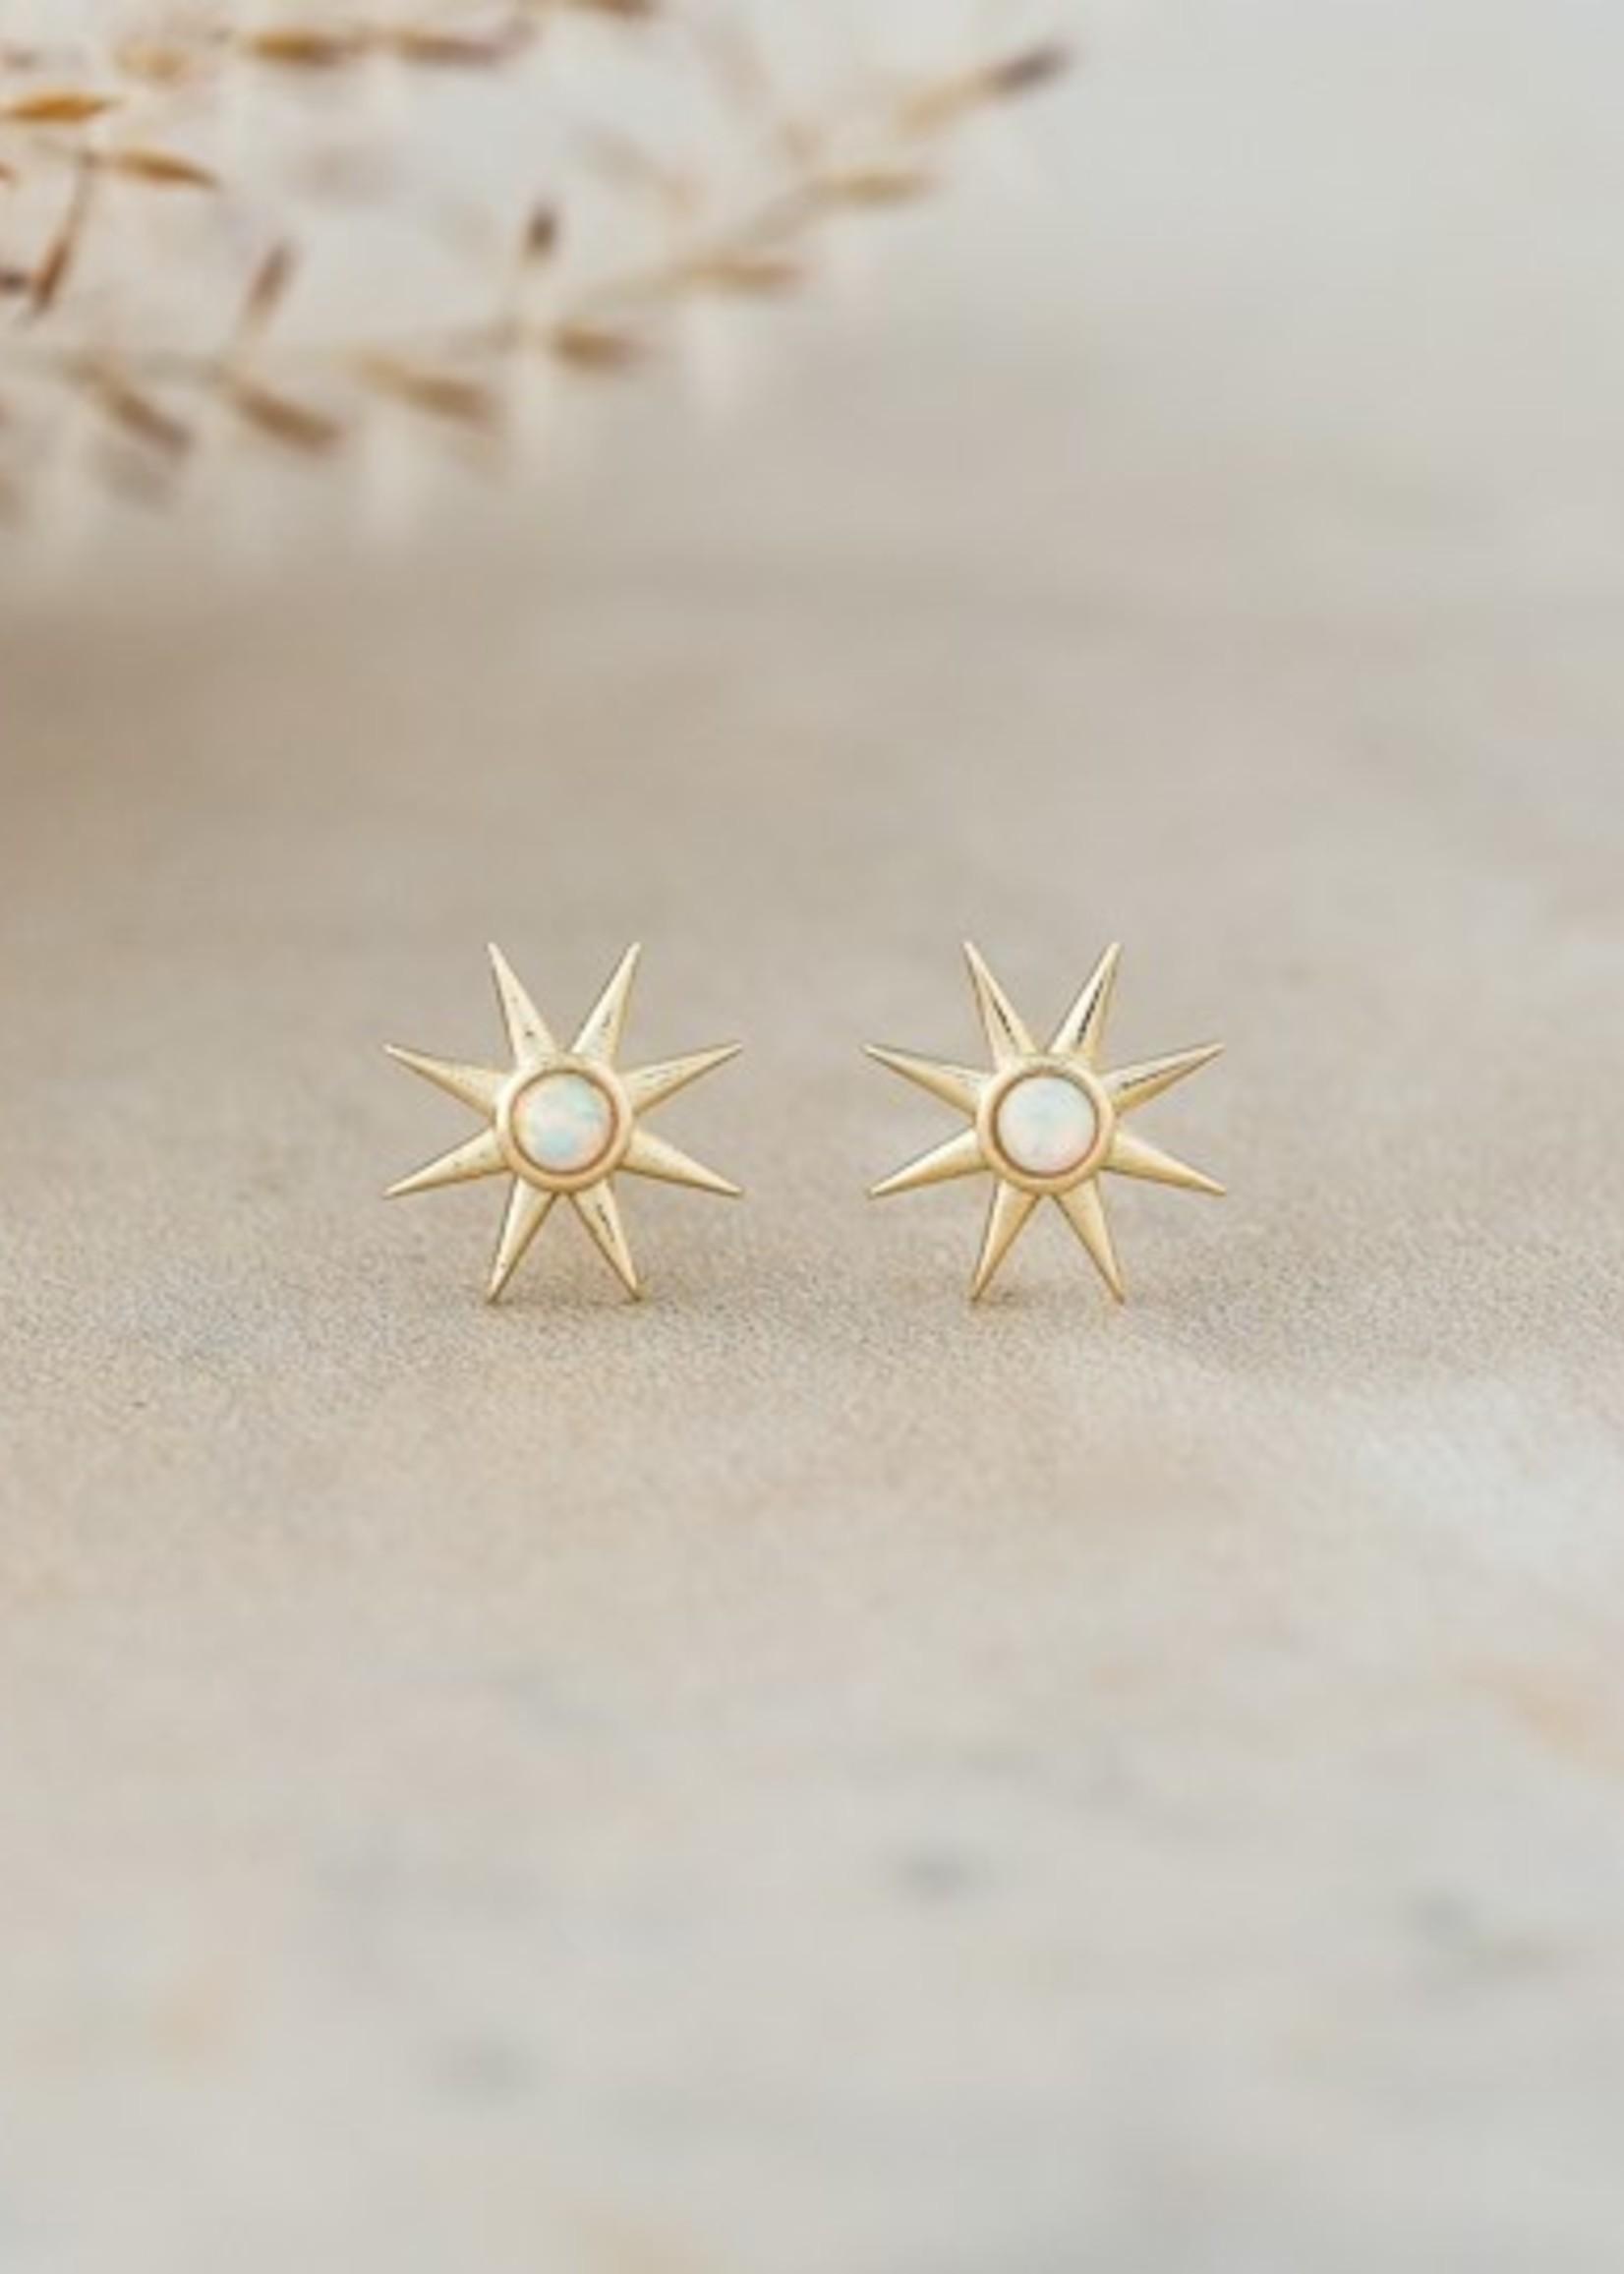 Glee Jewelry Soleil Studs/Gold/Opaline